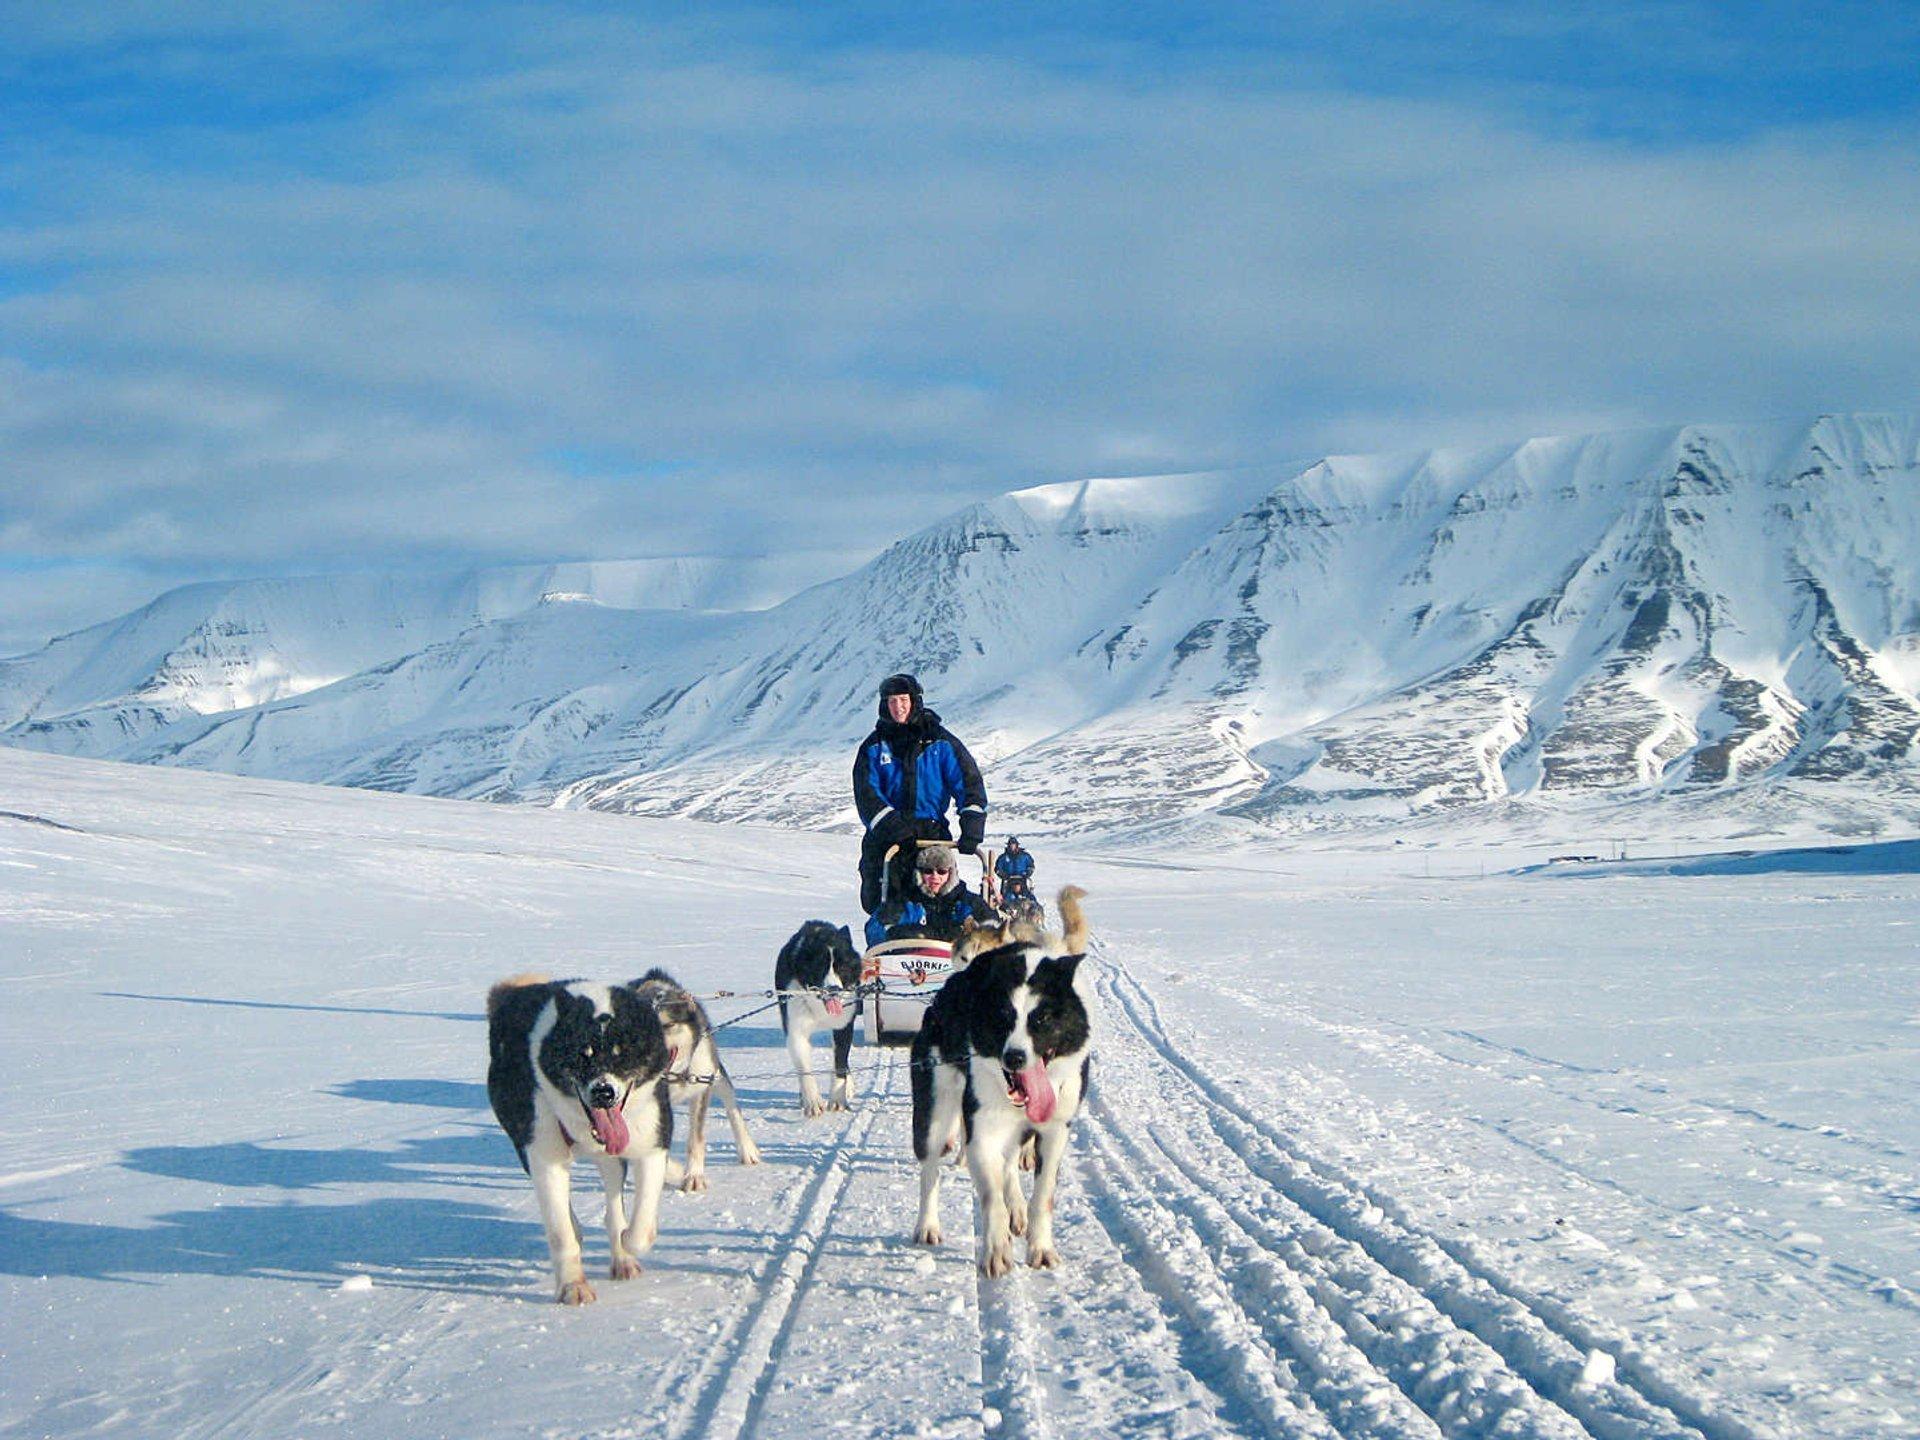 Dog Sledding in Svalbard 2020 - Best Time